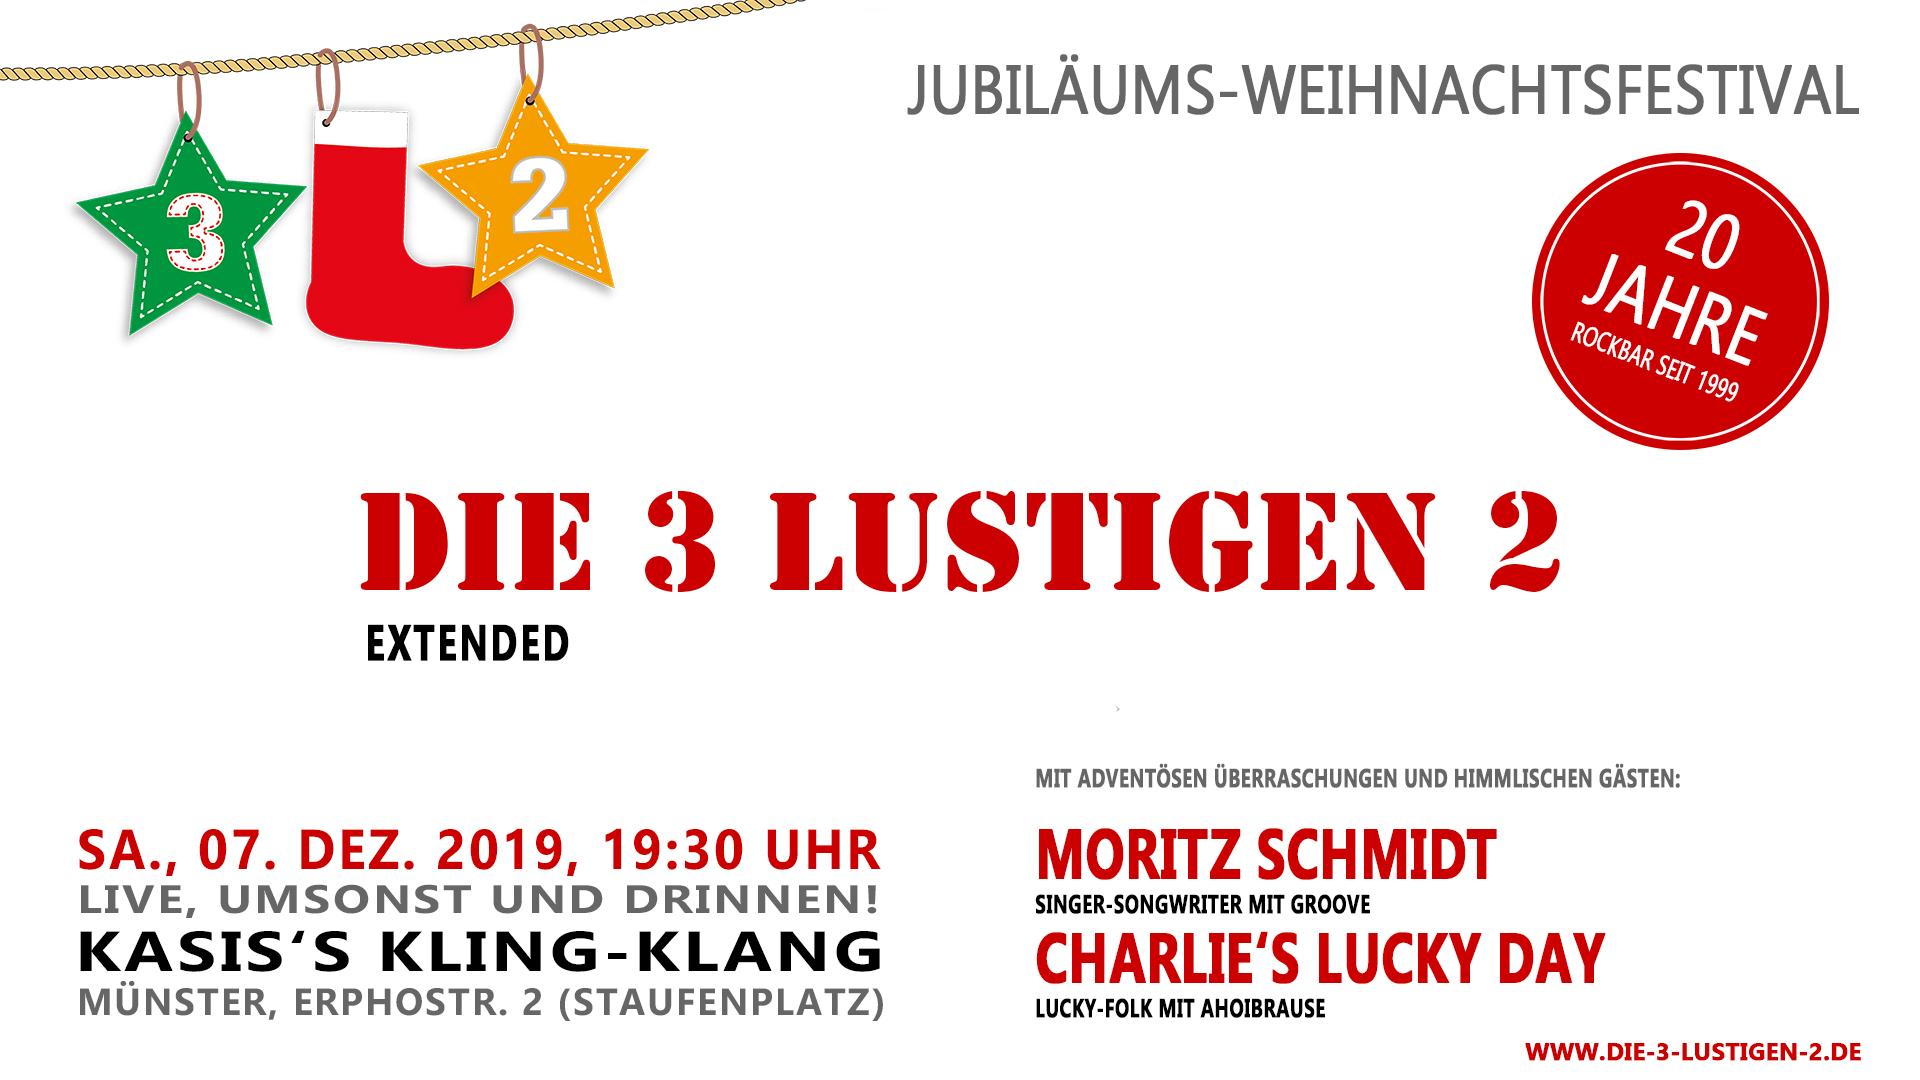 Die 3 lustigen 2 - 3L2-Weihnachtsfestival - Kling-Klang Münster